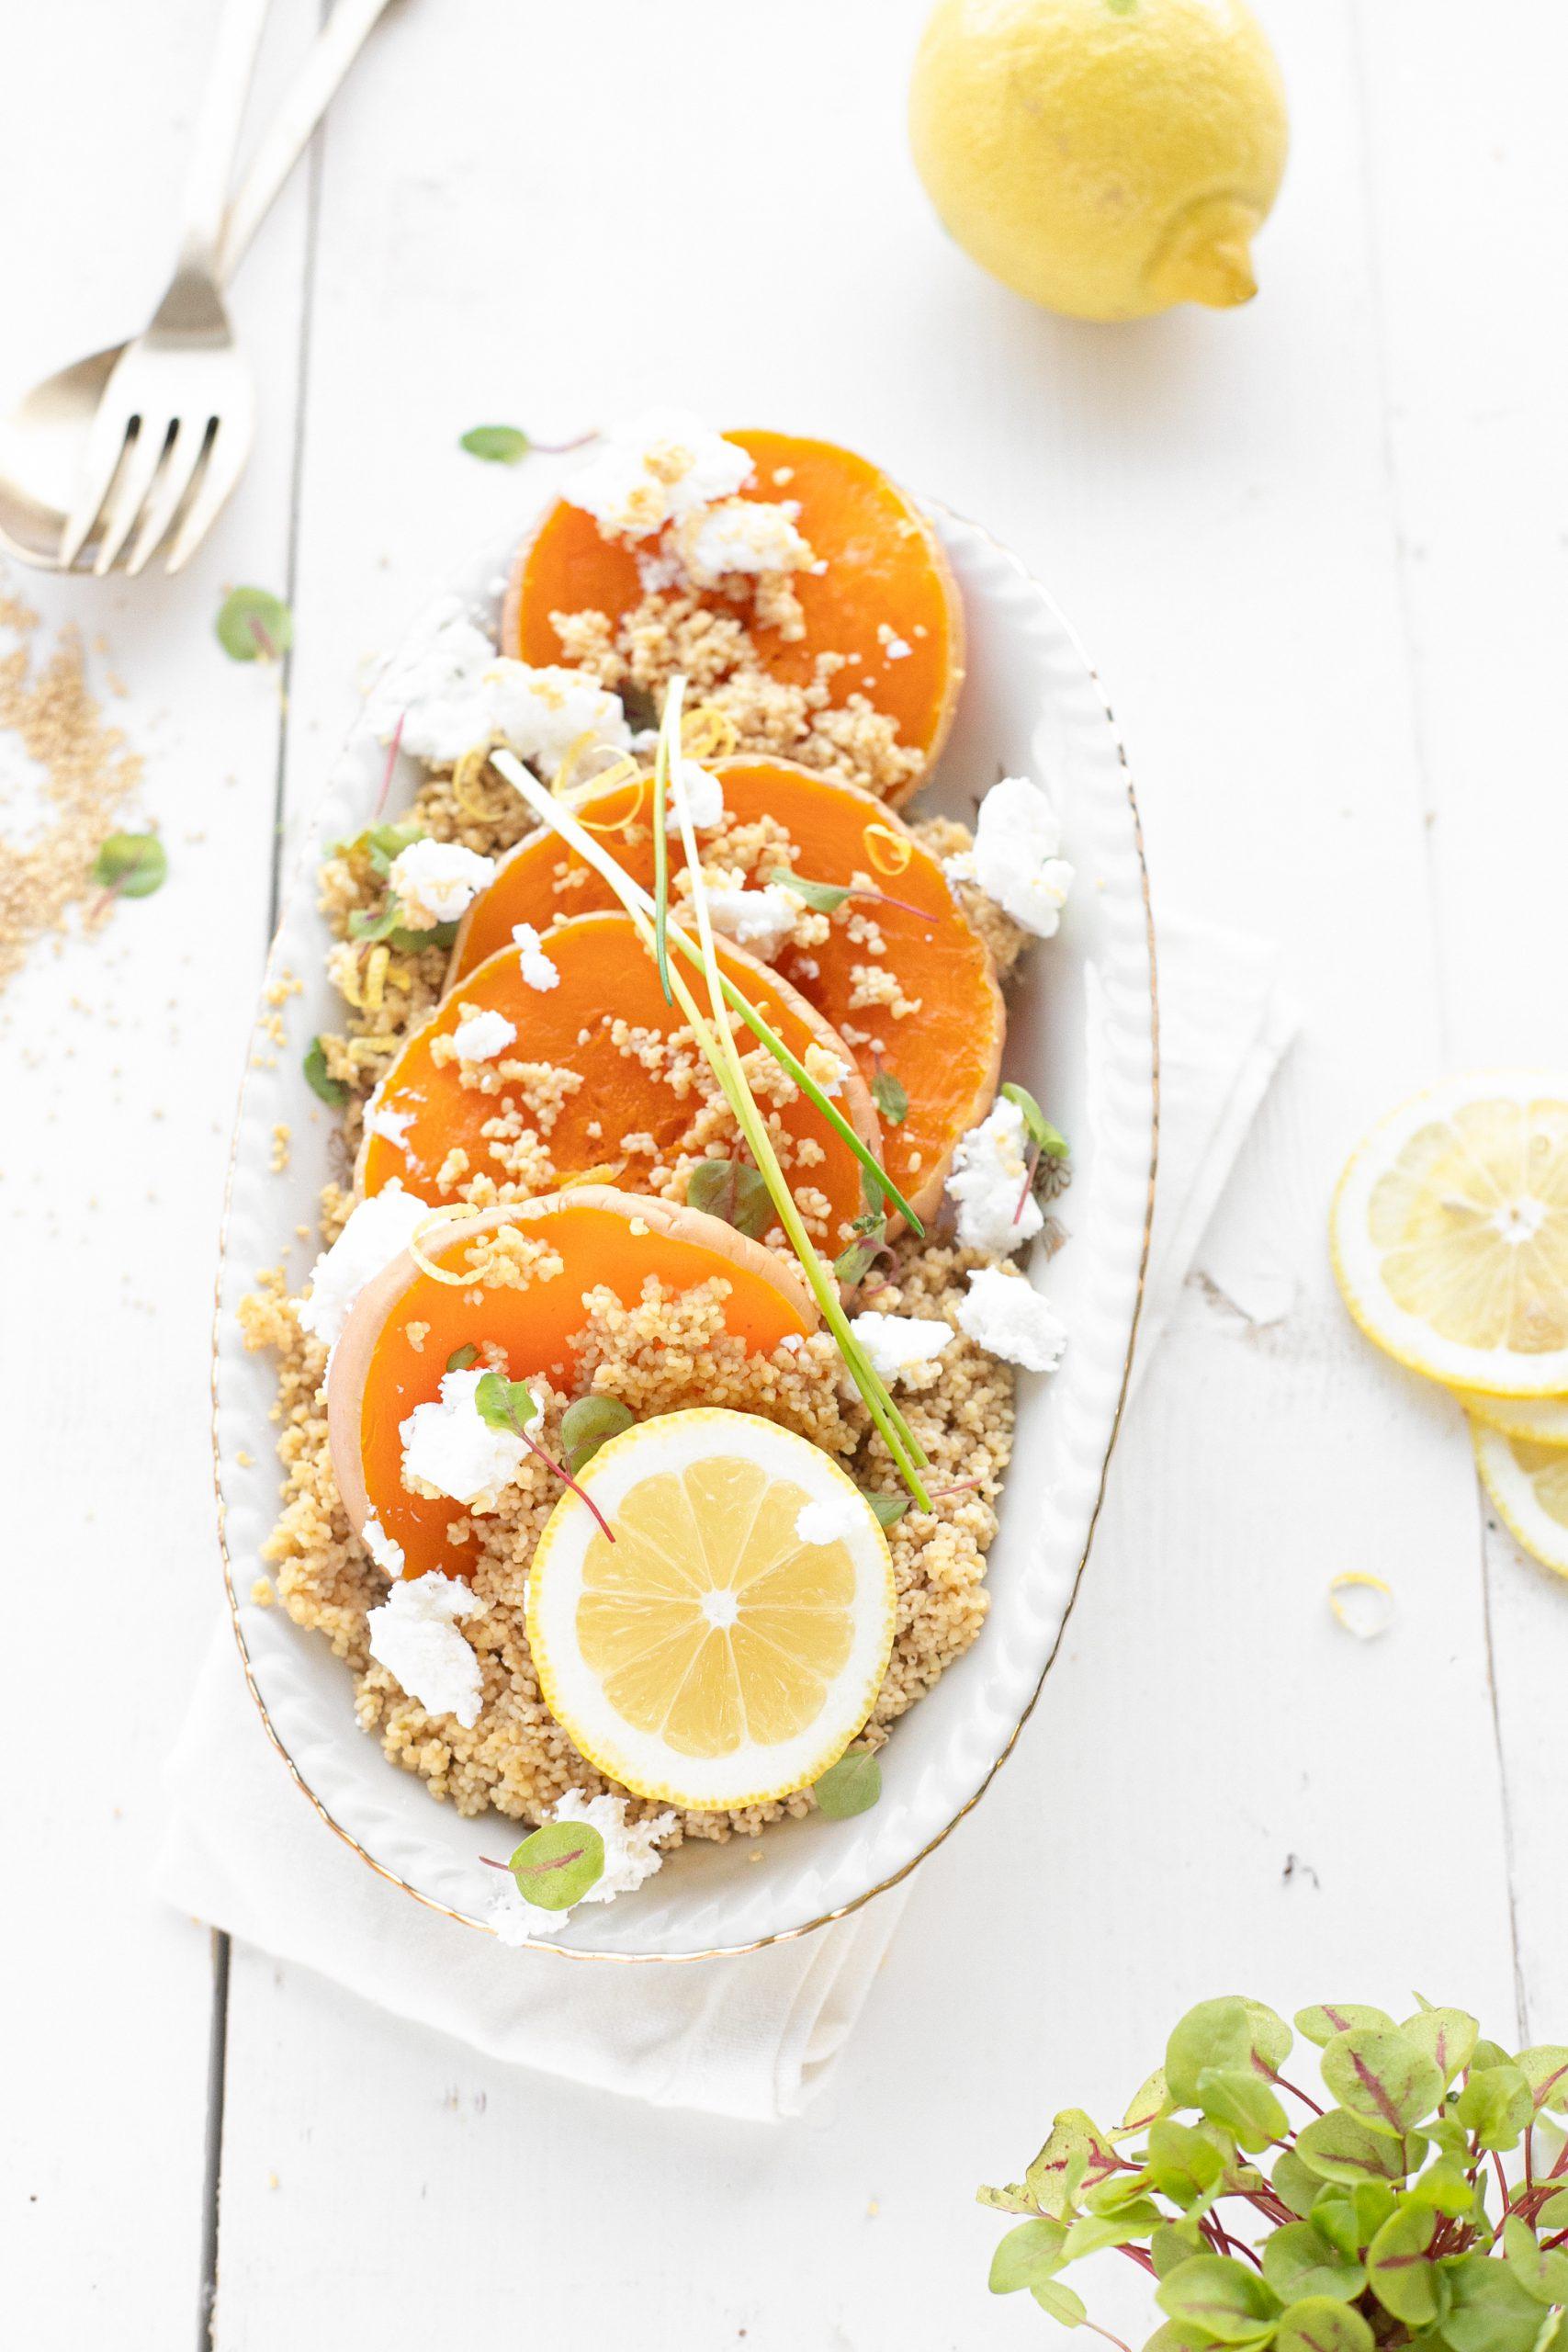 couscous salade met pompoen en geitenkaas 'the lemon kitchen